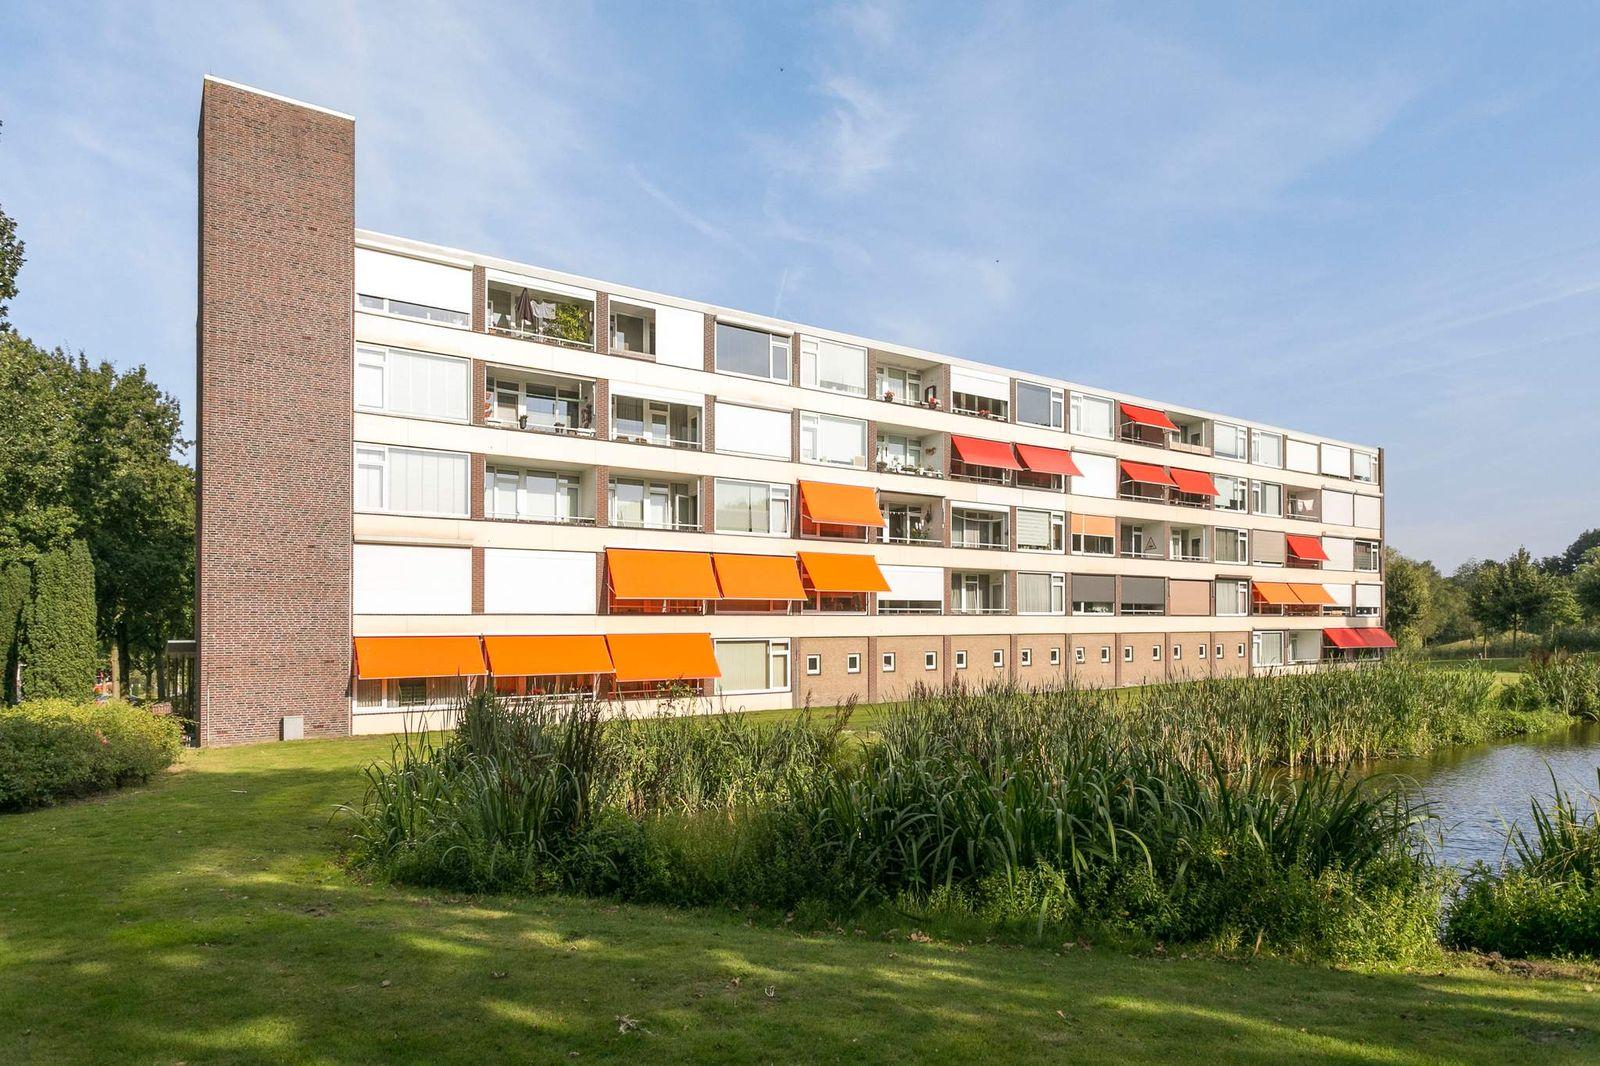 Hertogenlaan 174, Oosterhout NB